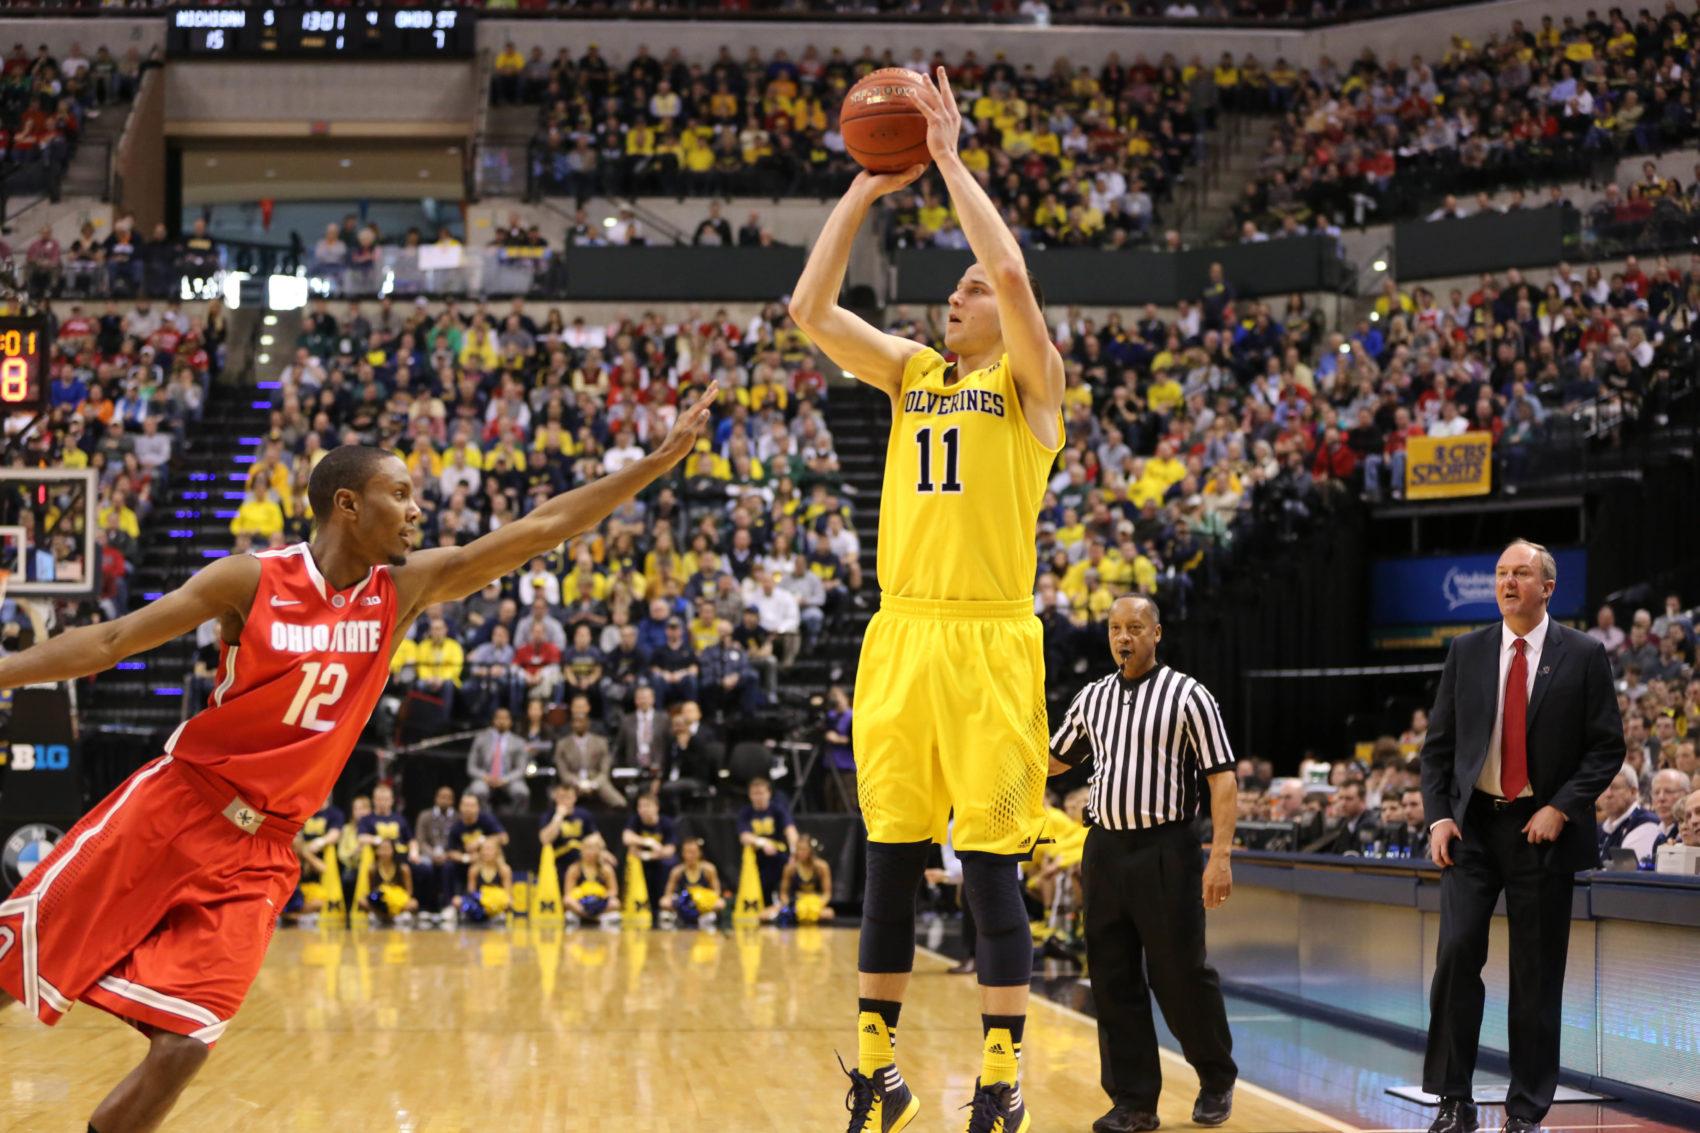 Michigan 72, Ohio State 69-5